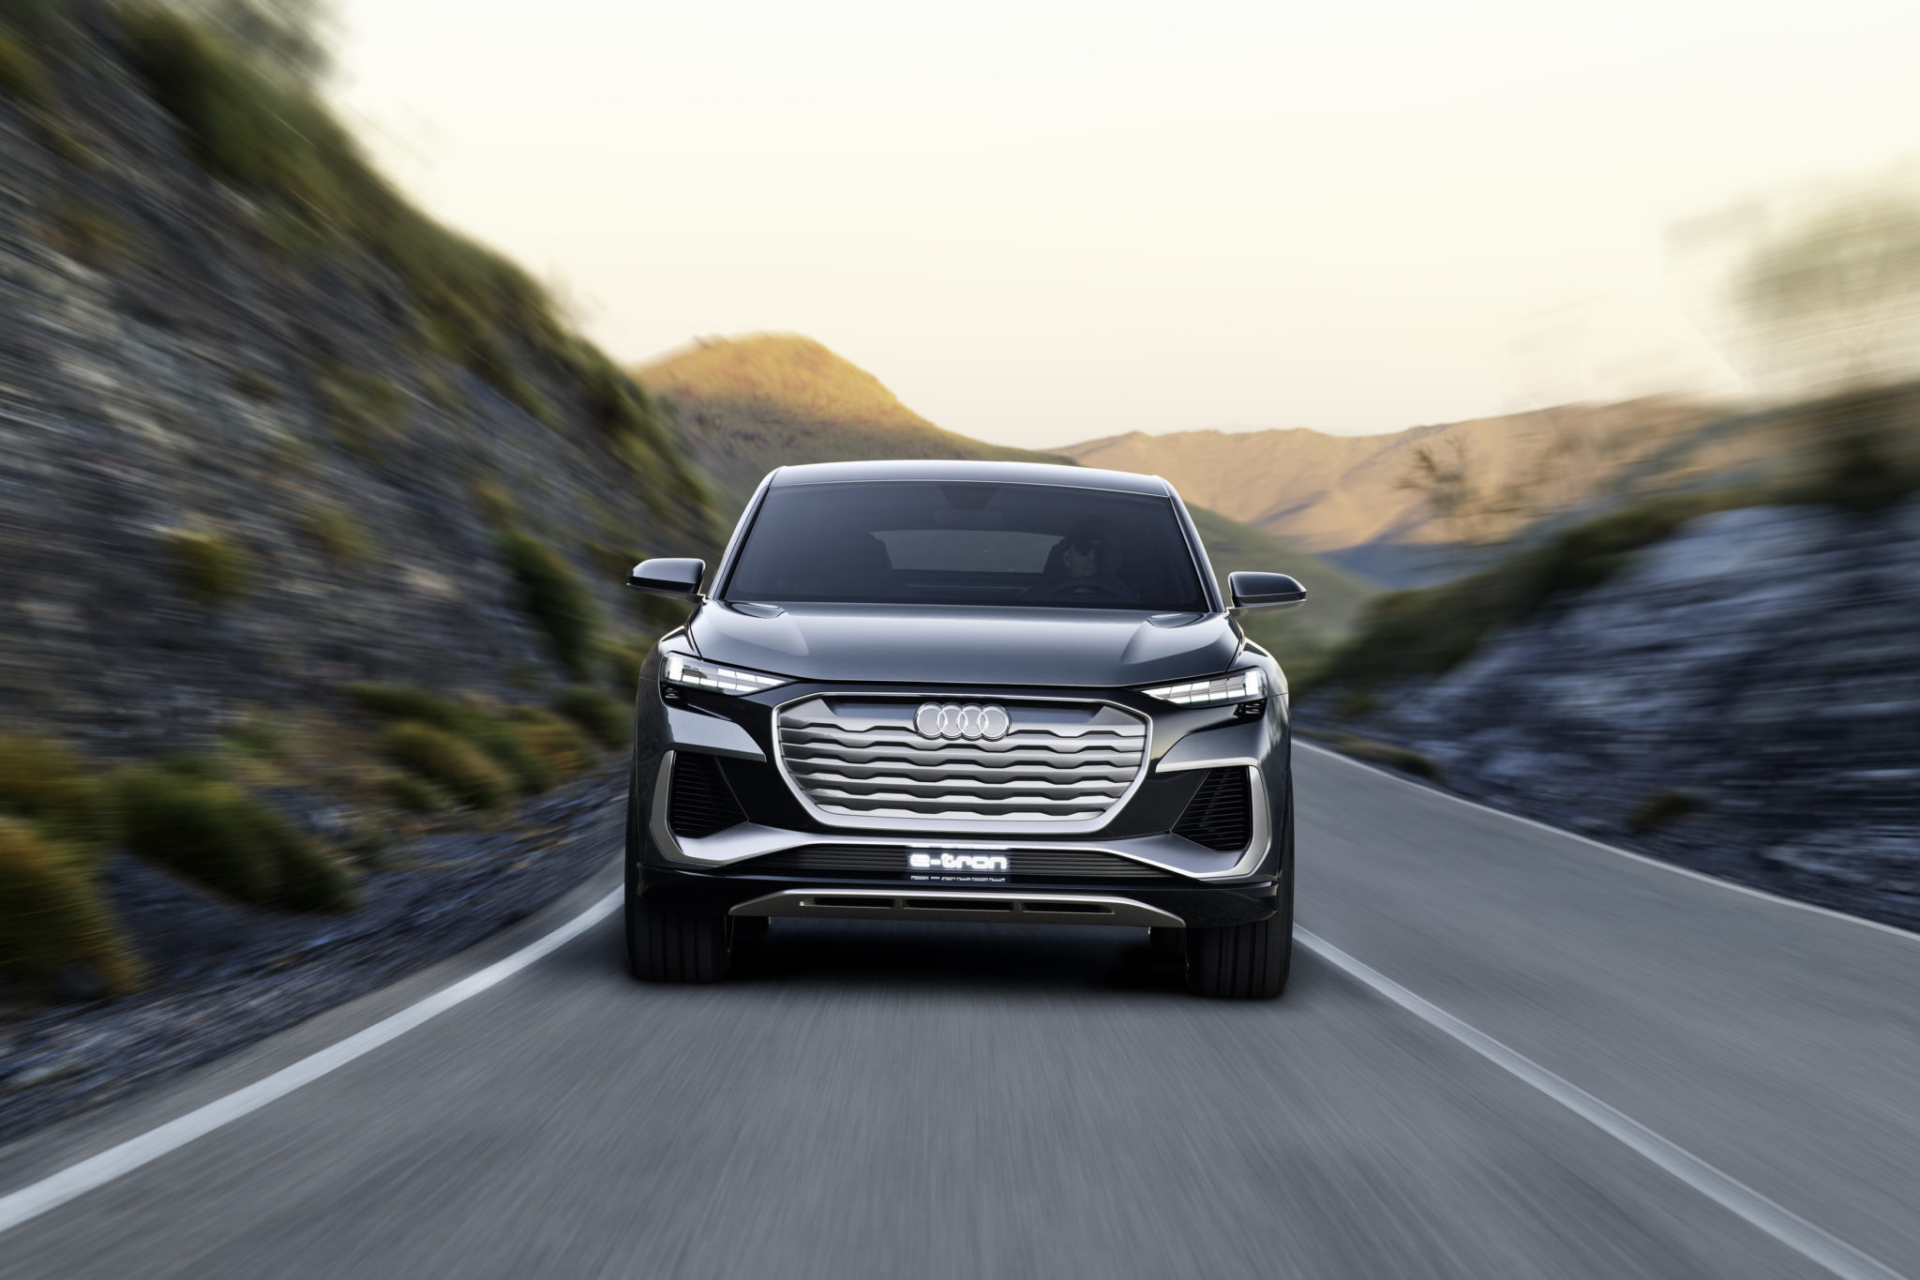 Опубликованы фотографии концептов Audi Q4 e-tron и Q4 Sportback e-tron